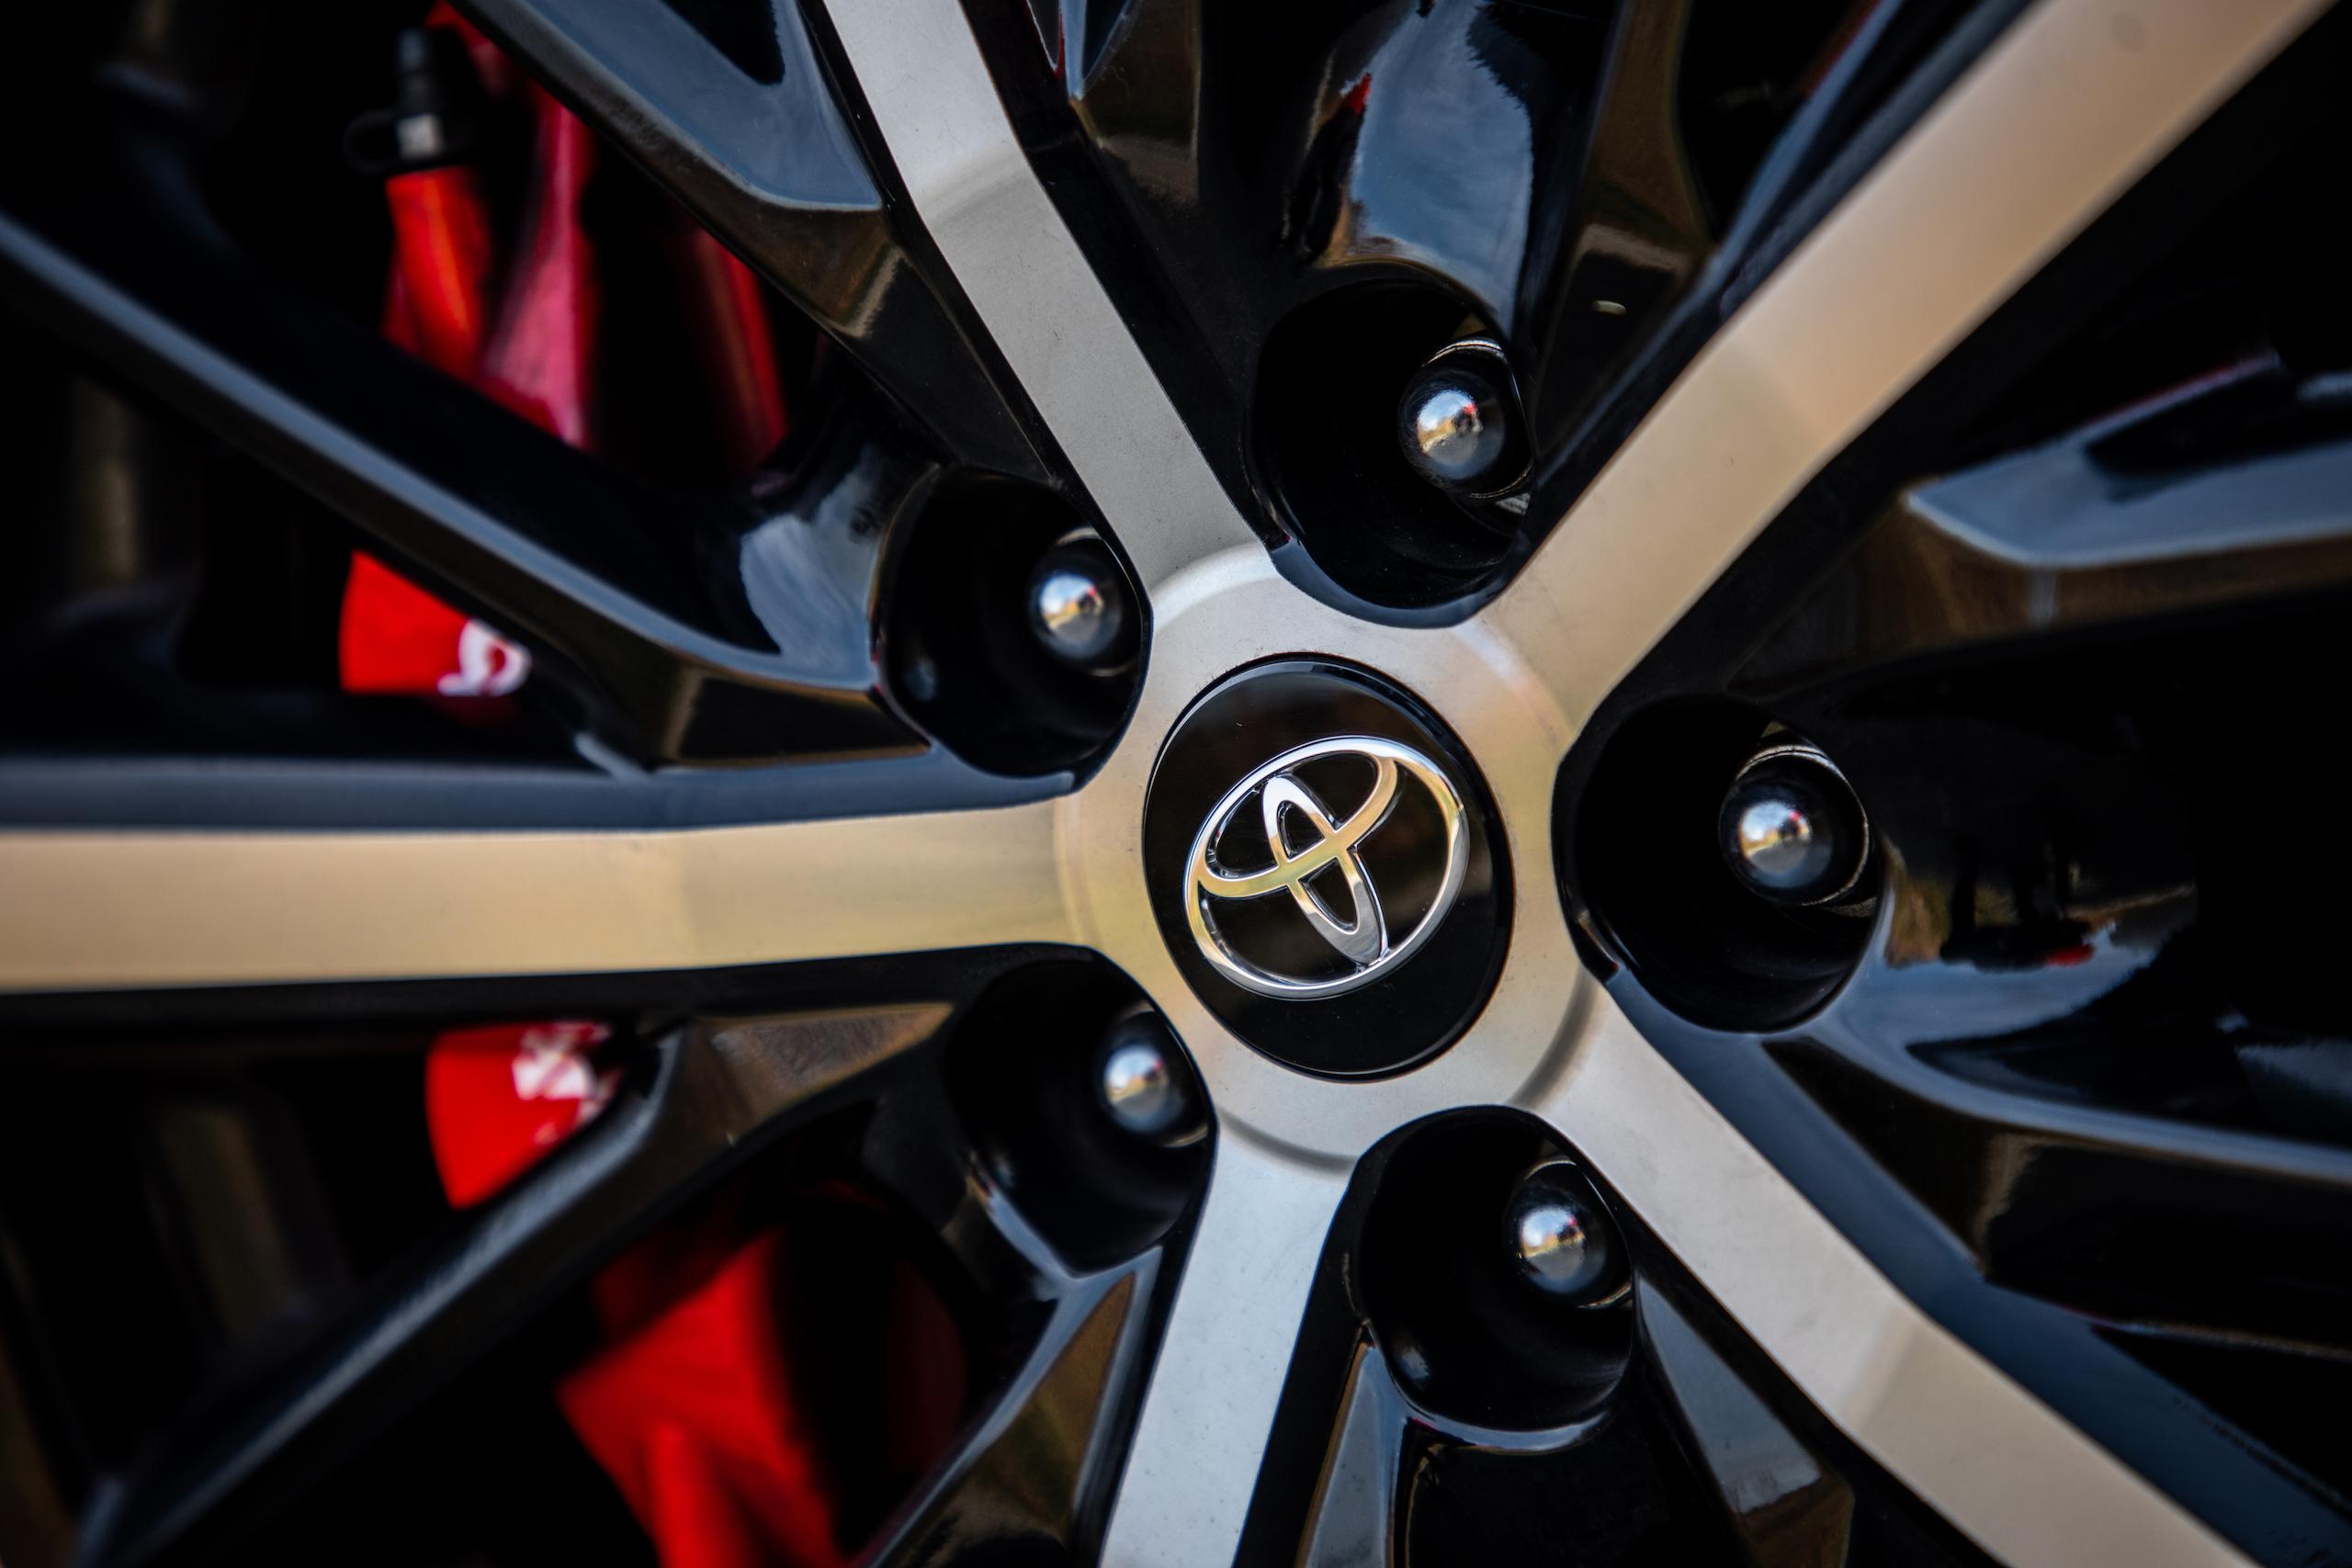 2020 Toyota 86 GT wheel detail close up